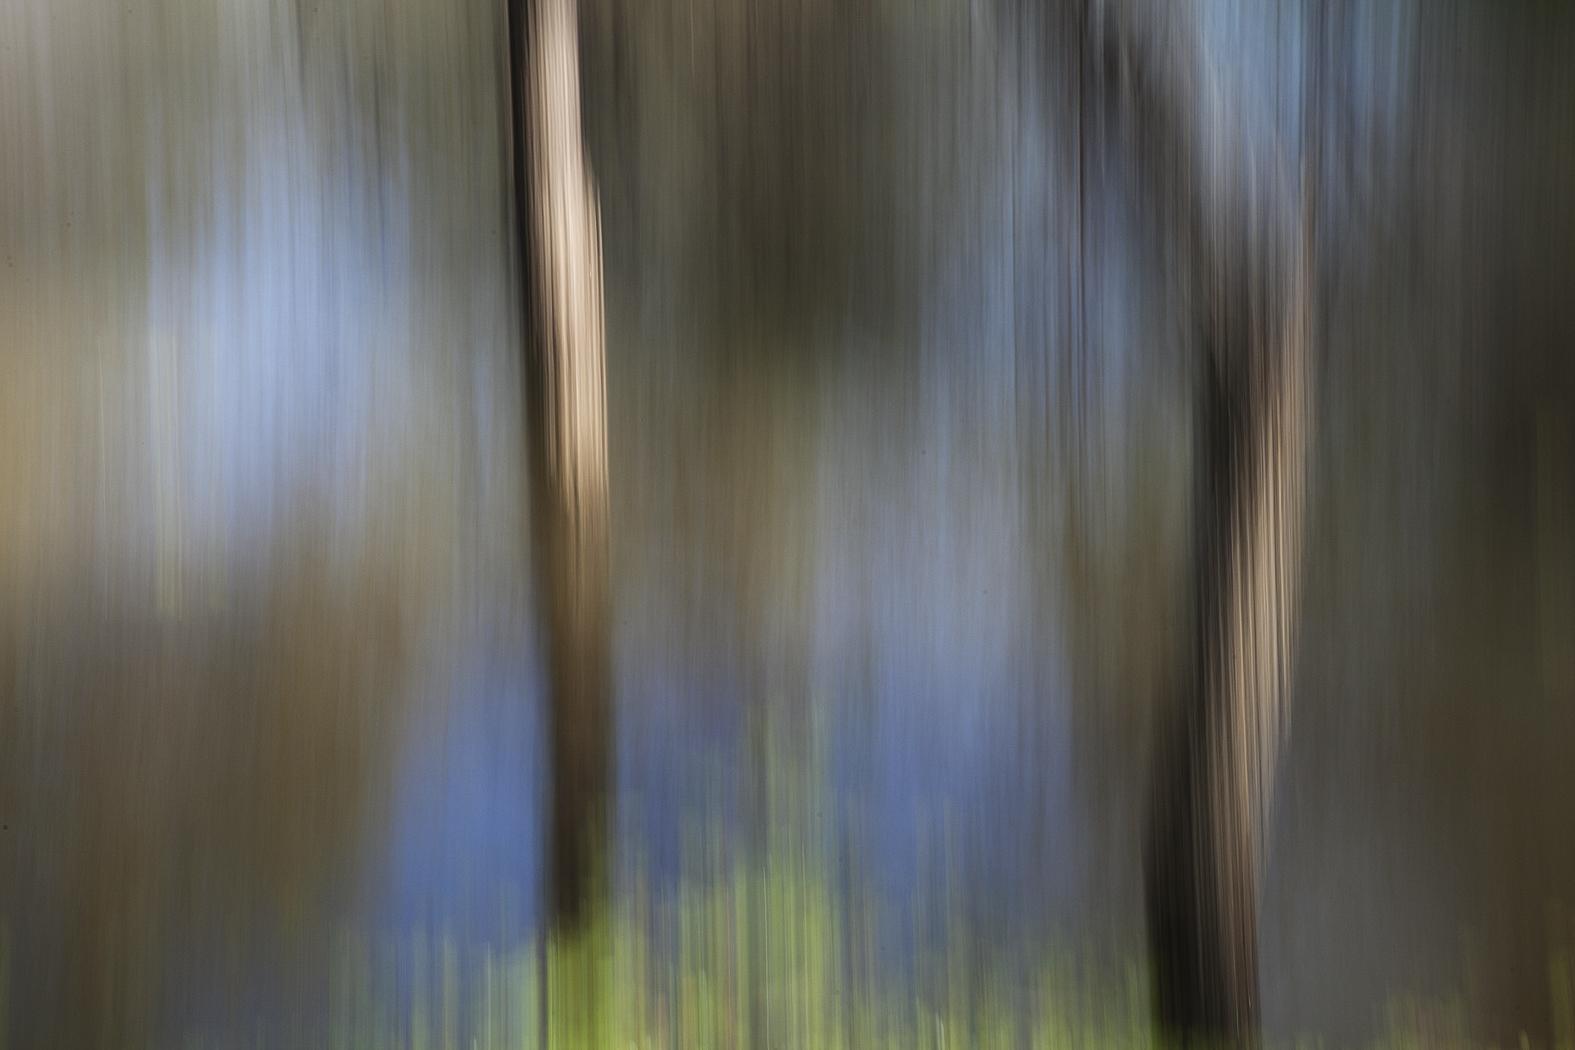 woodlands_#5.jpg